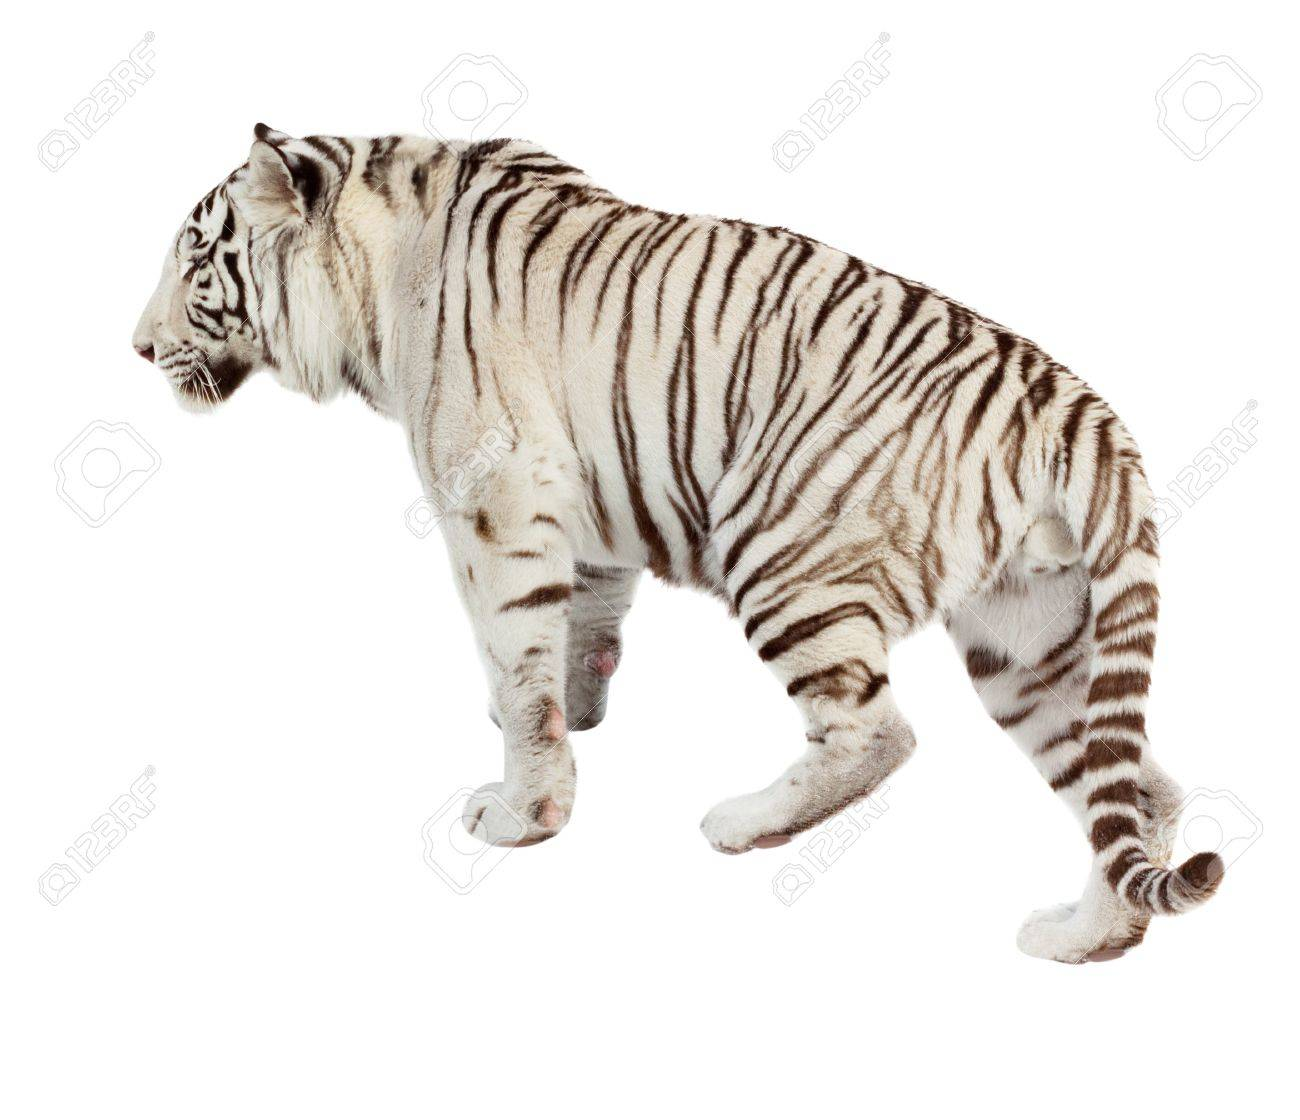 Walking white tiger  Isolated  over white background Stock Photo - 12793857